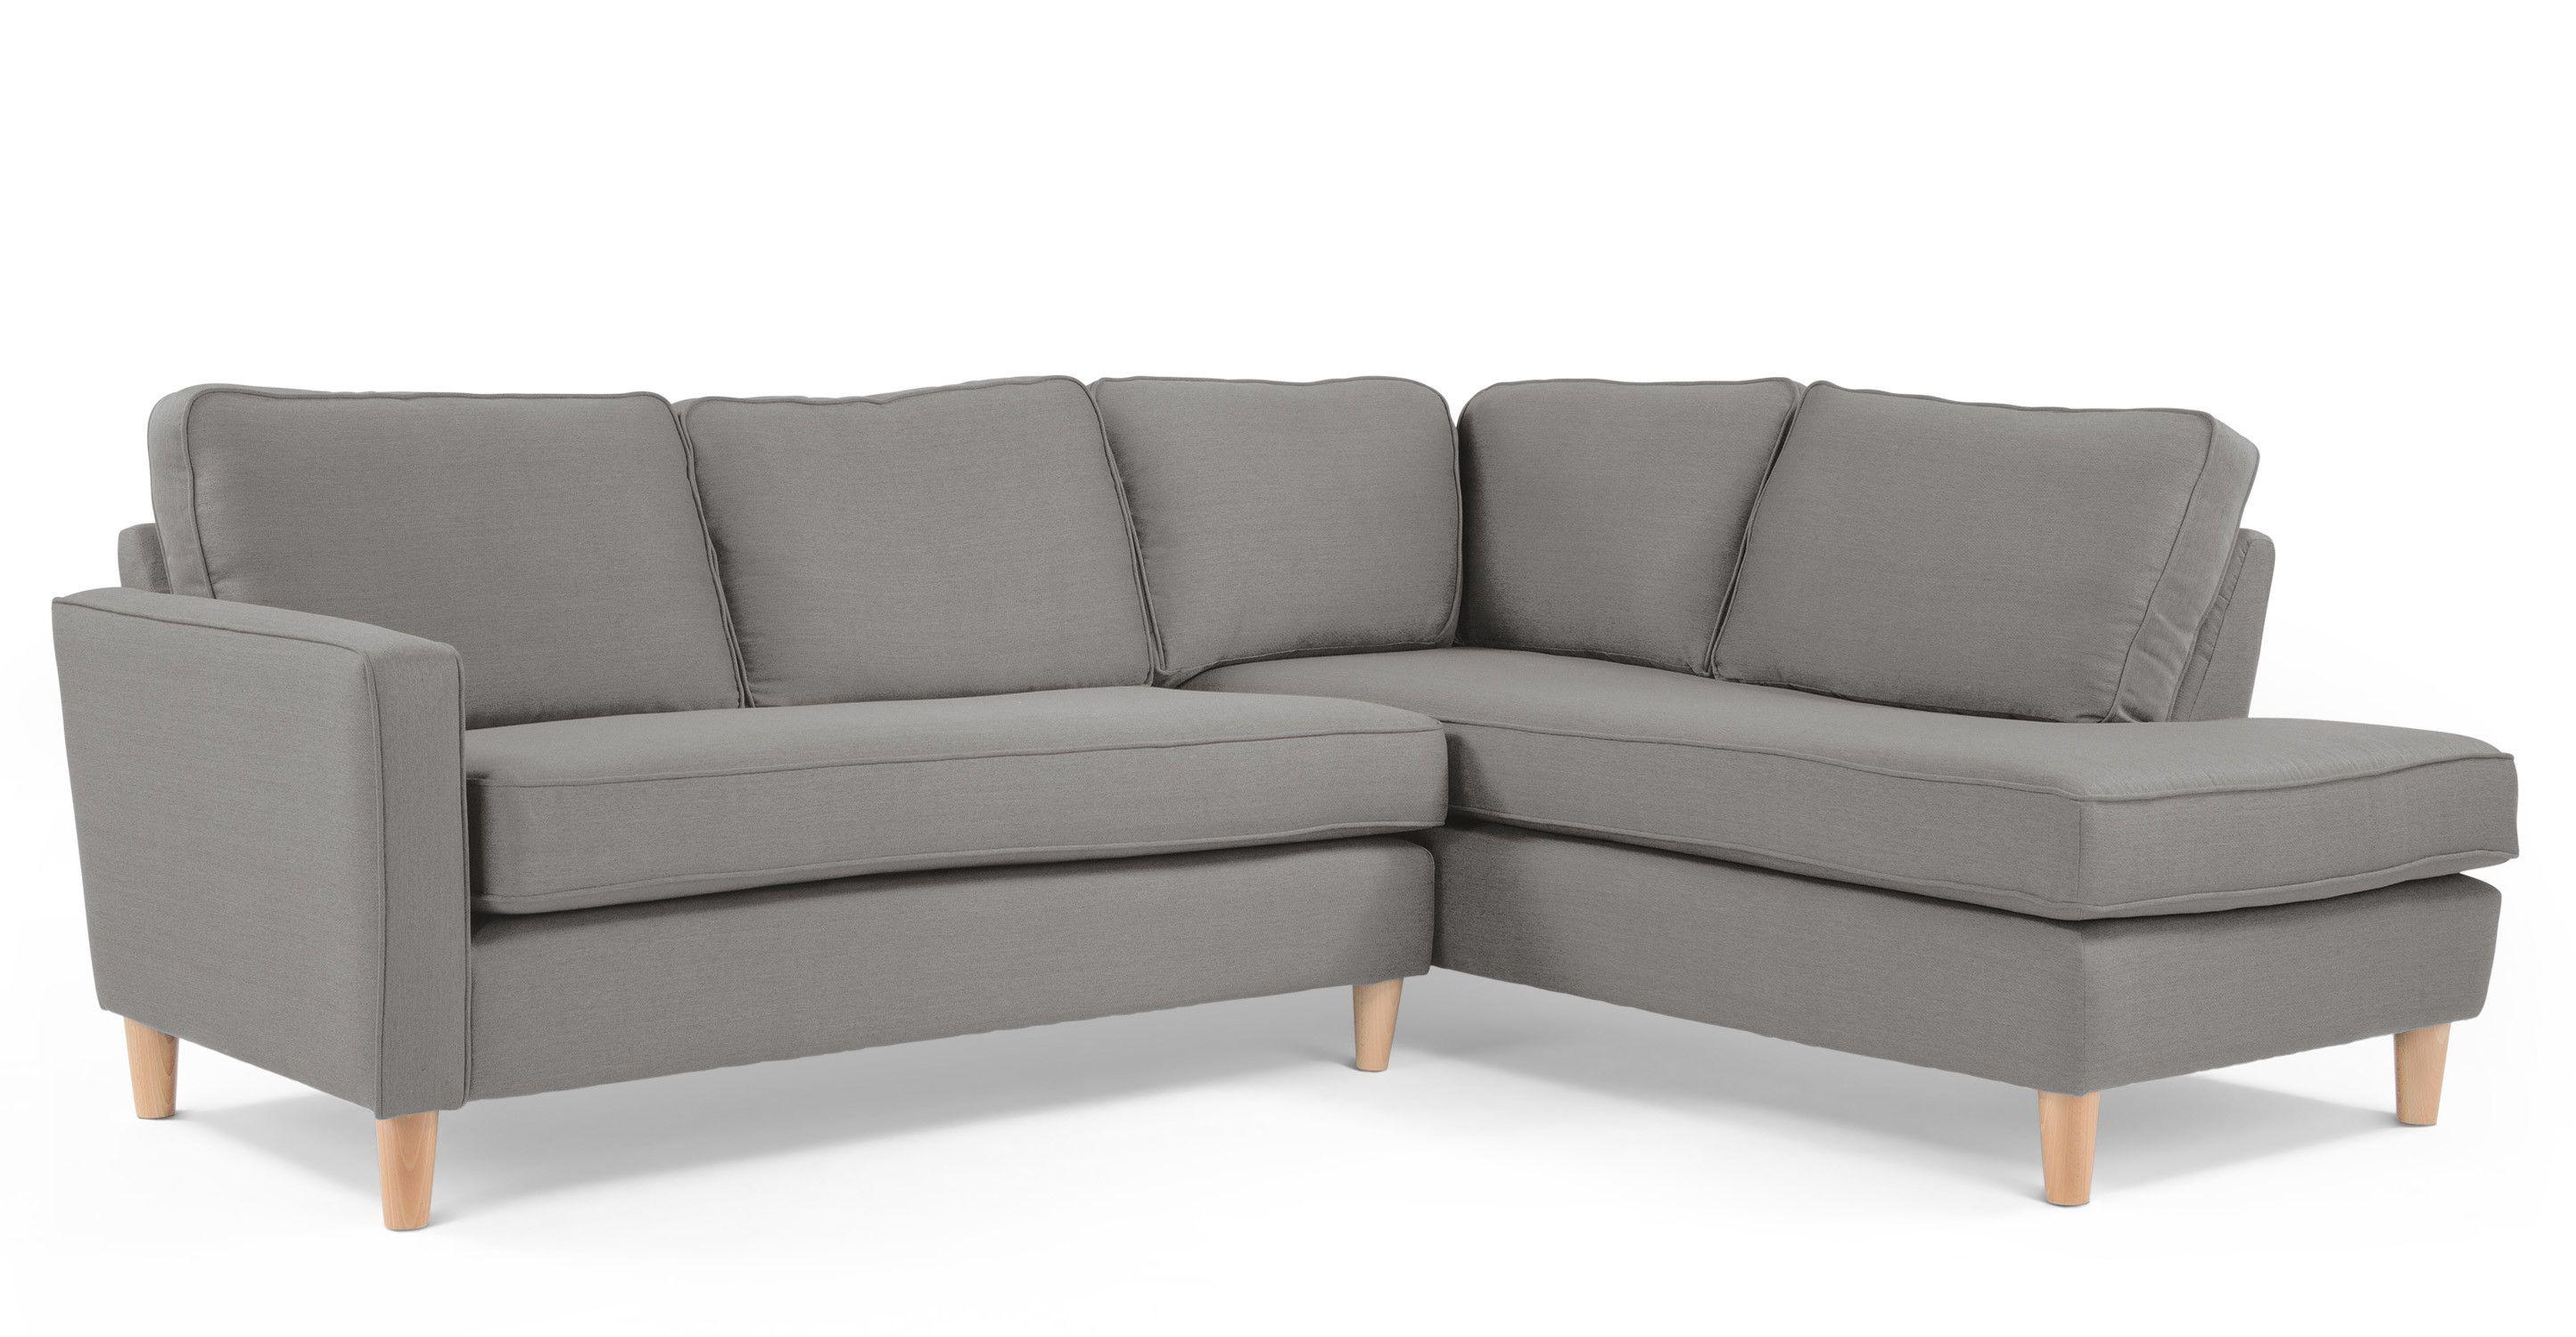 Lugano Right Hand Facing Corner Sofa Group In City Grey Made Com Corner Sofa Sofa Corner Sofa Bed